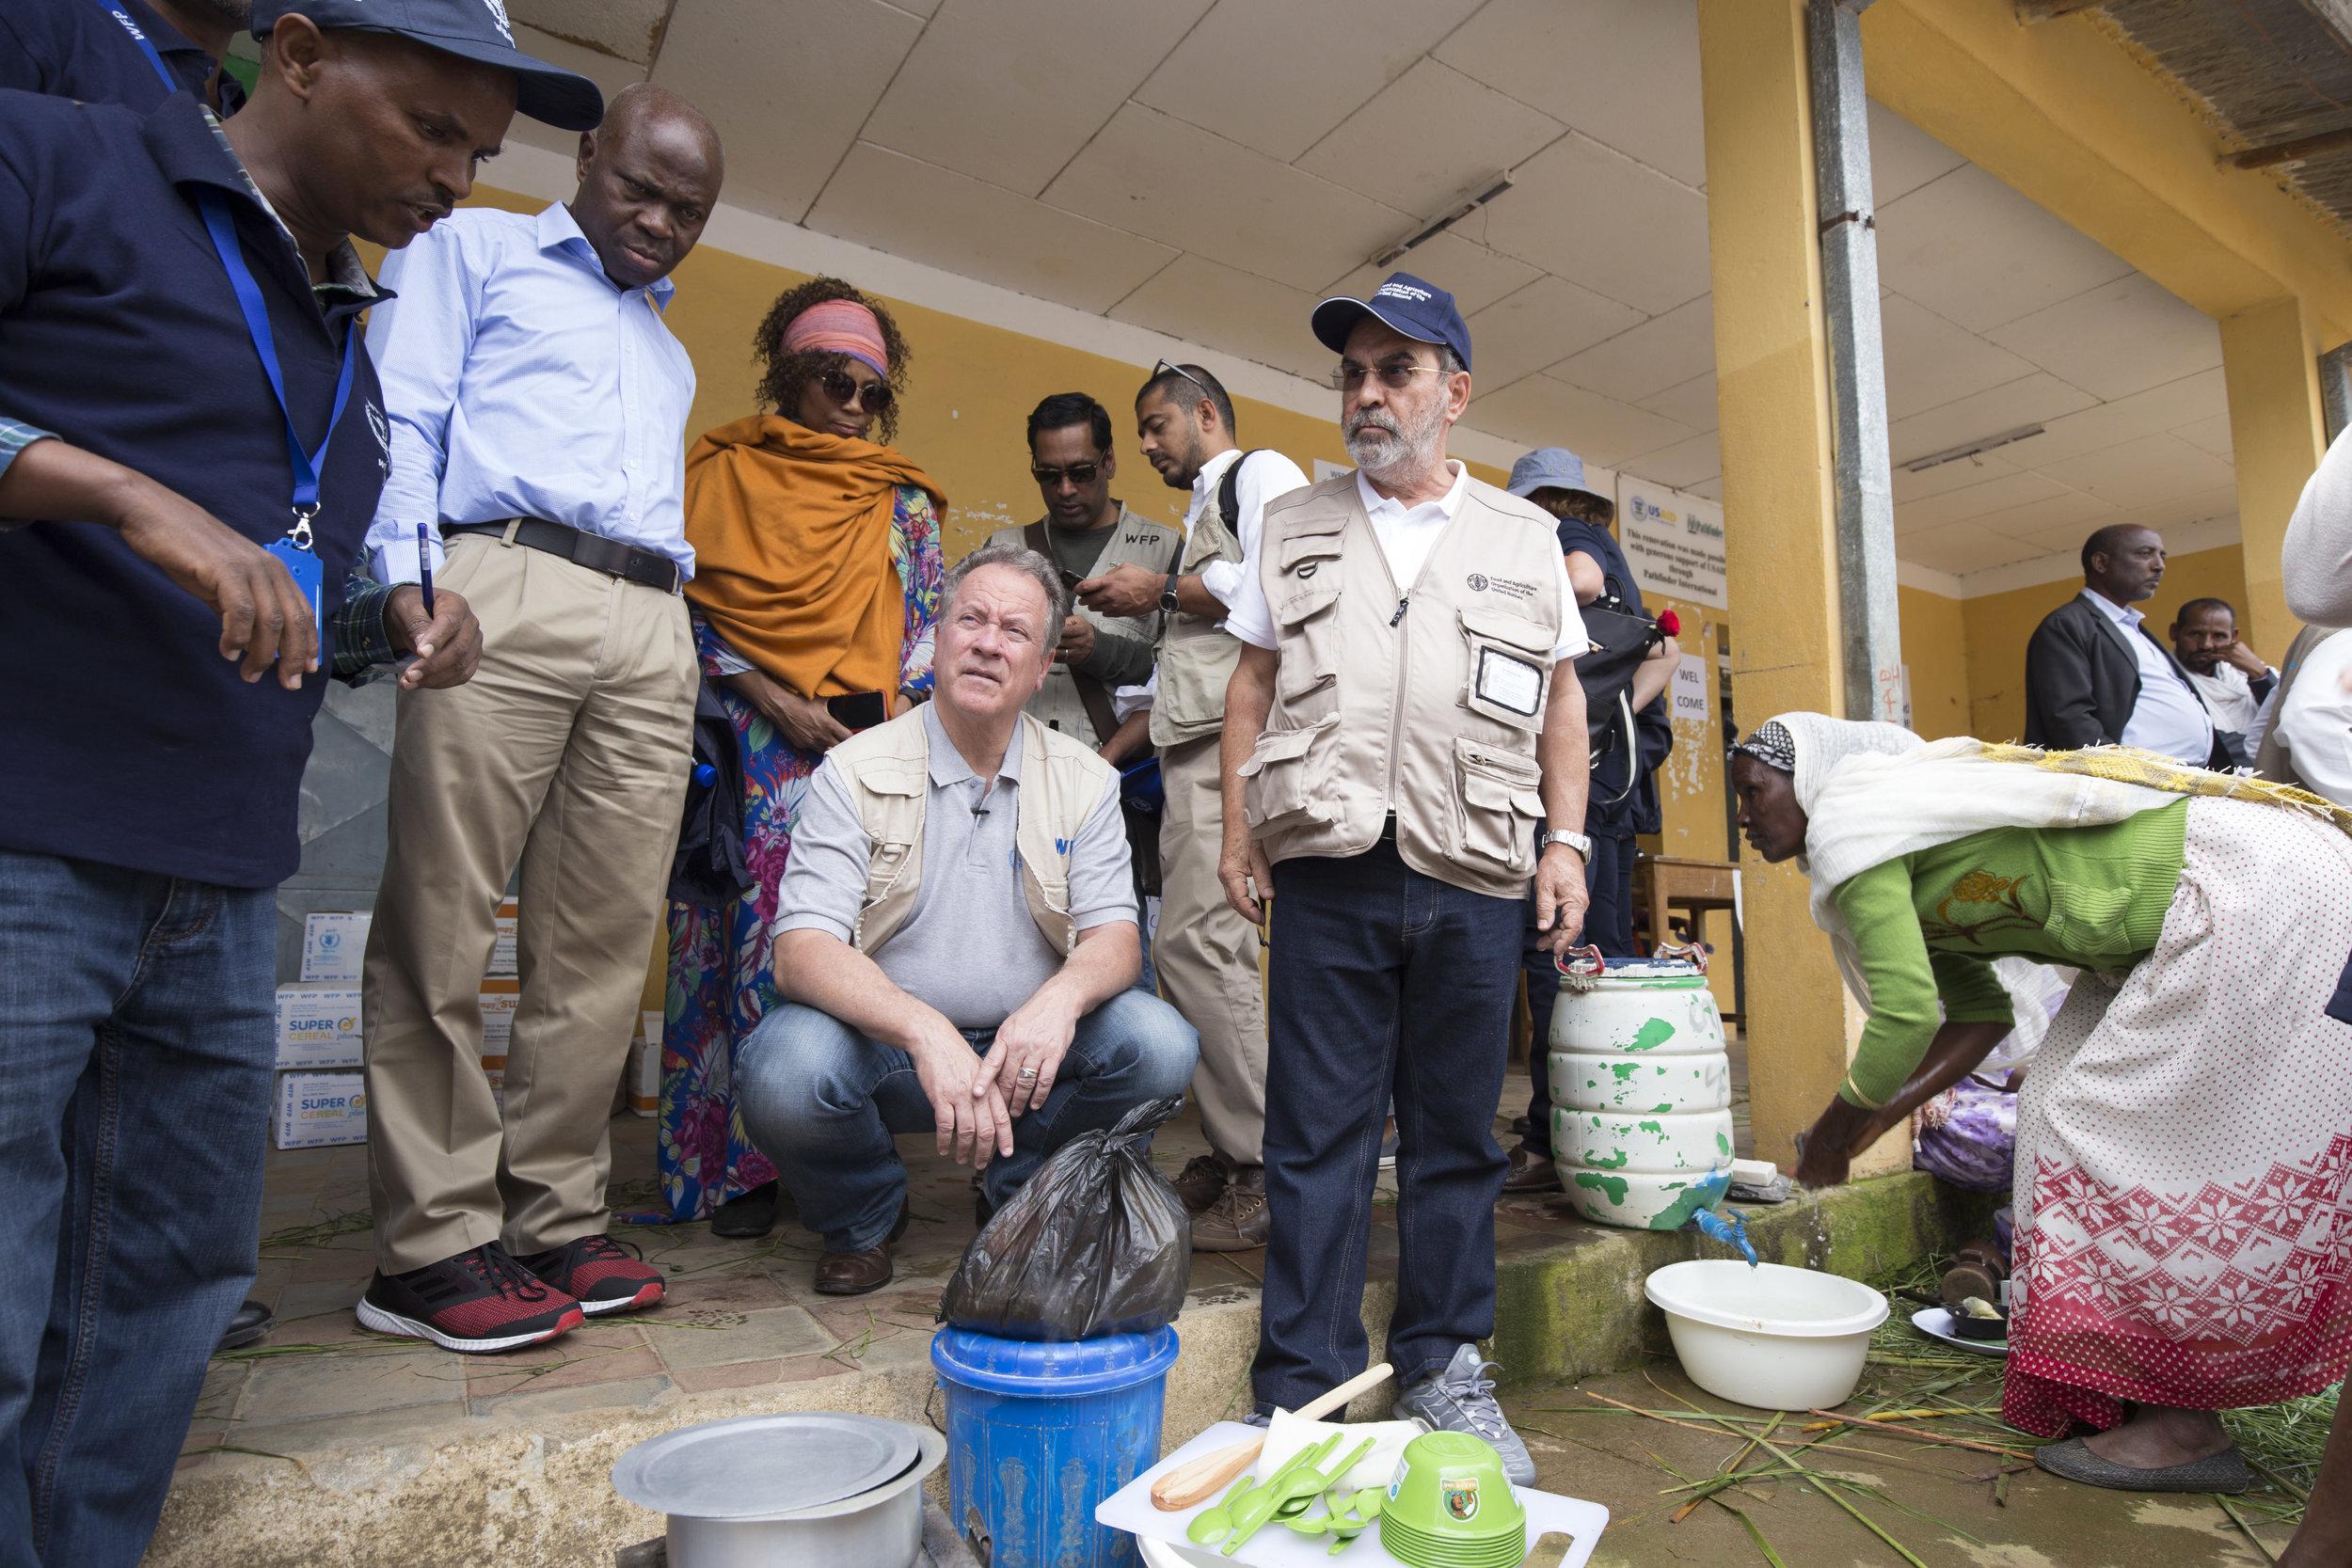 Ethiopia, Tigray, Hayelom, 02 September, 2017. Photo Credit: FAO/IFAD/WFP/Petterik Wiggers